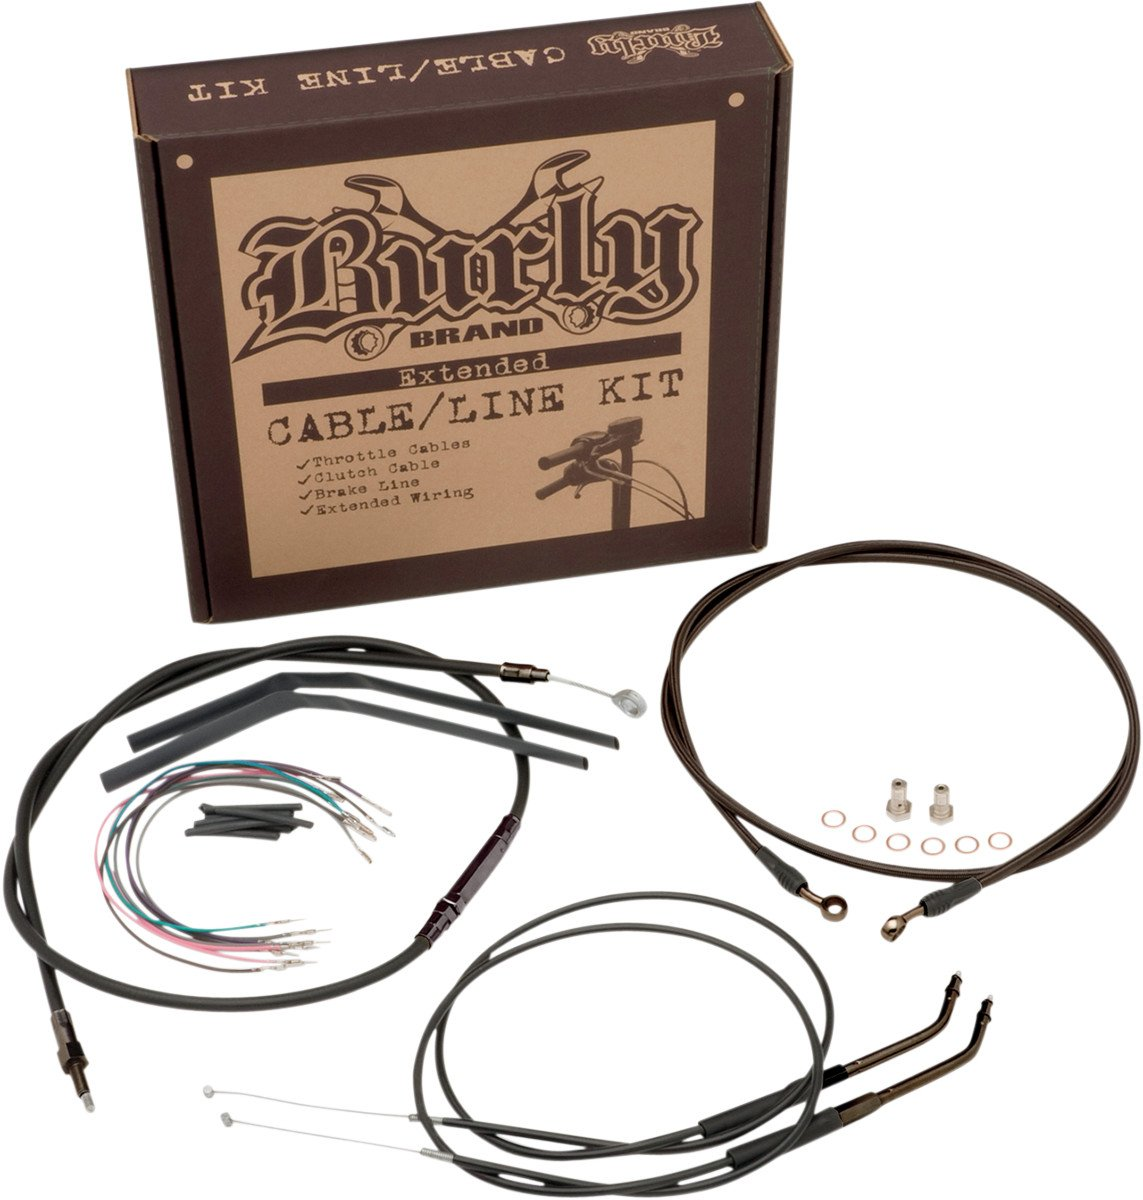 Burly Brand Cable/Brake Line Kit for Ape Hangers for Harley Davidson 2007-10 FLST/C/F/N models - 18'' by BURLY